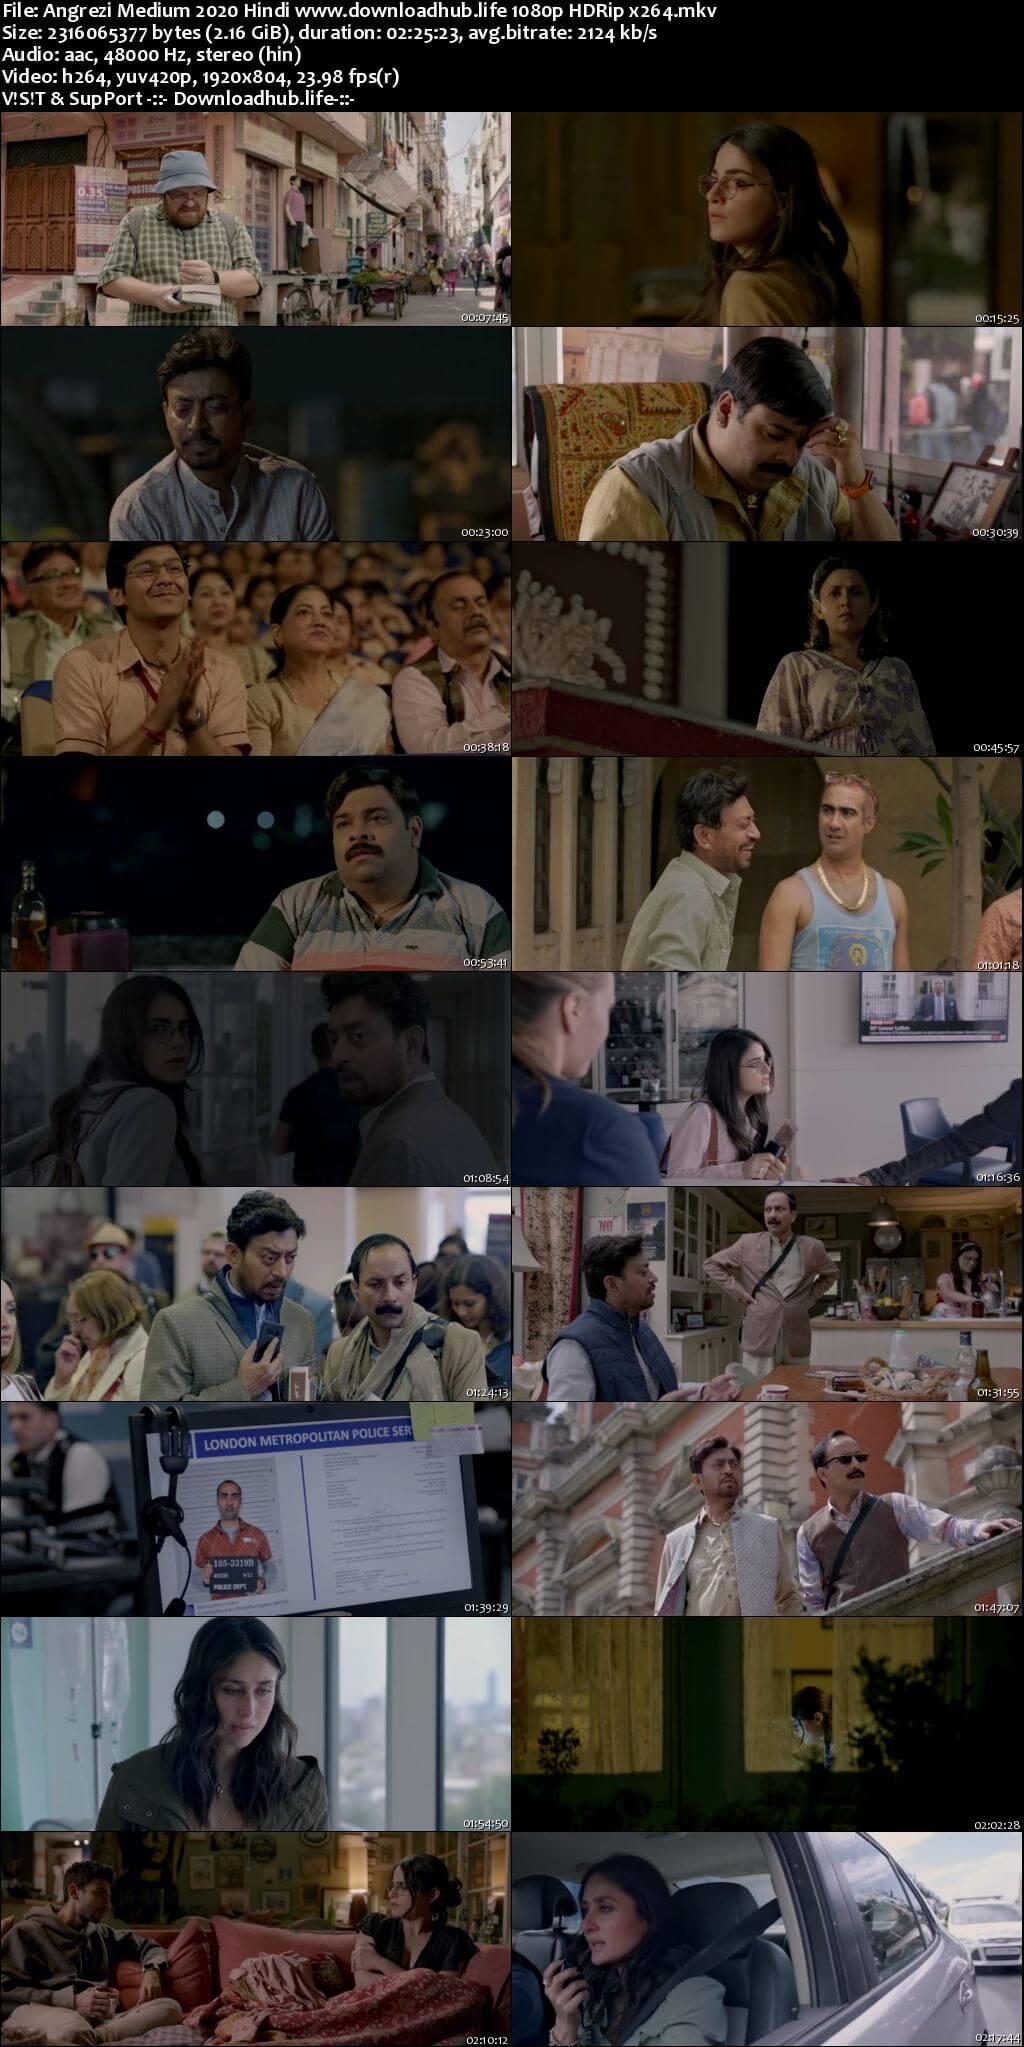 Angrezi Medium 2020 Hindi 1080p HDRip x264